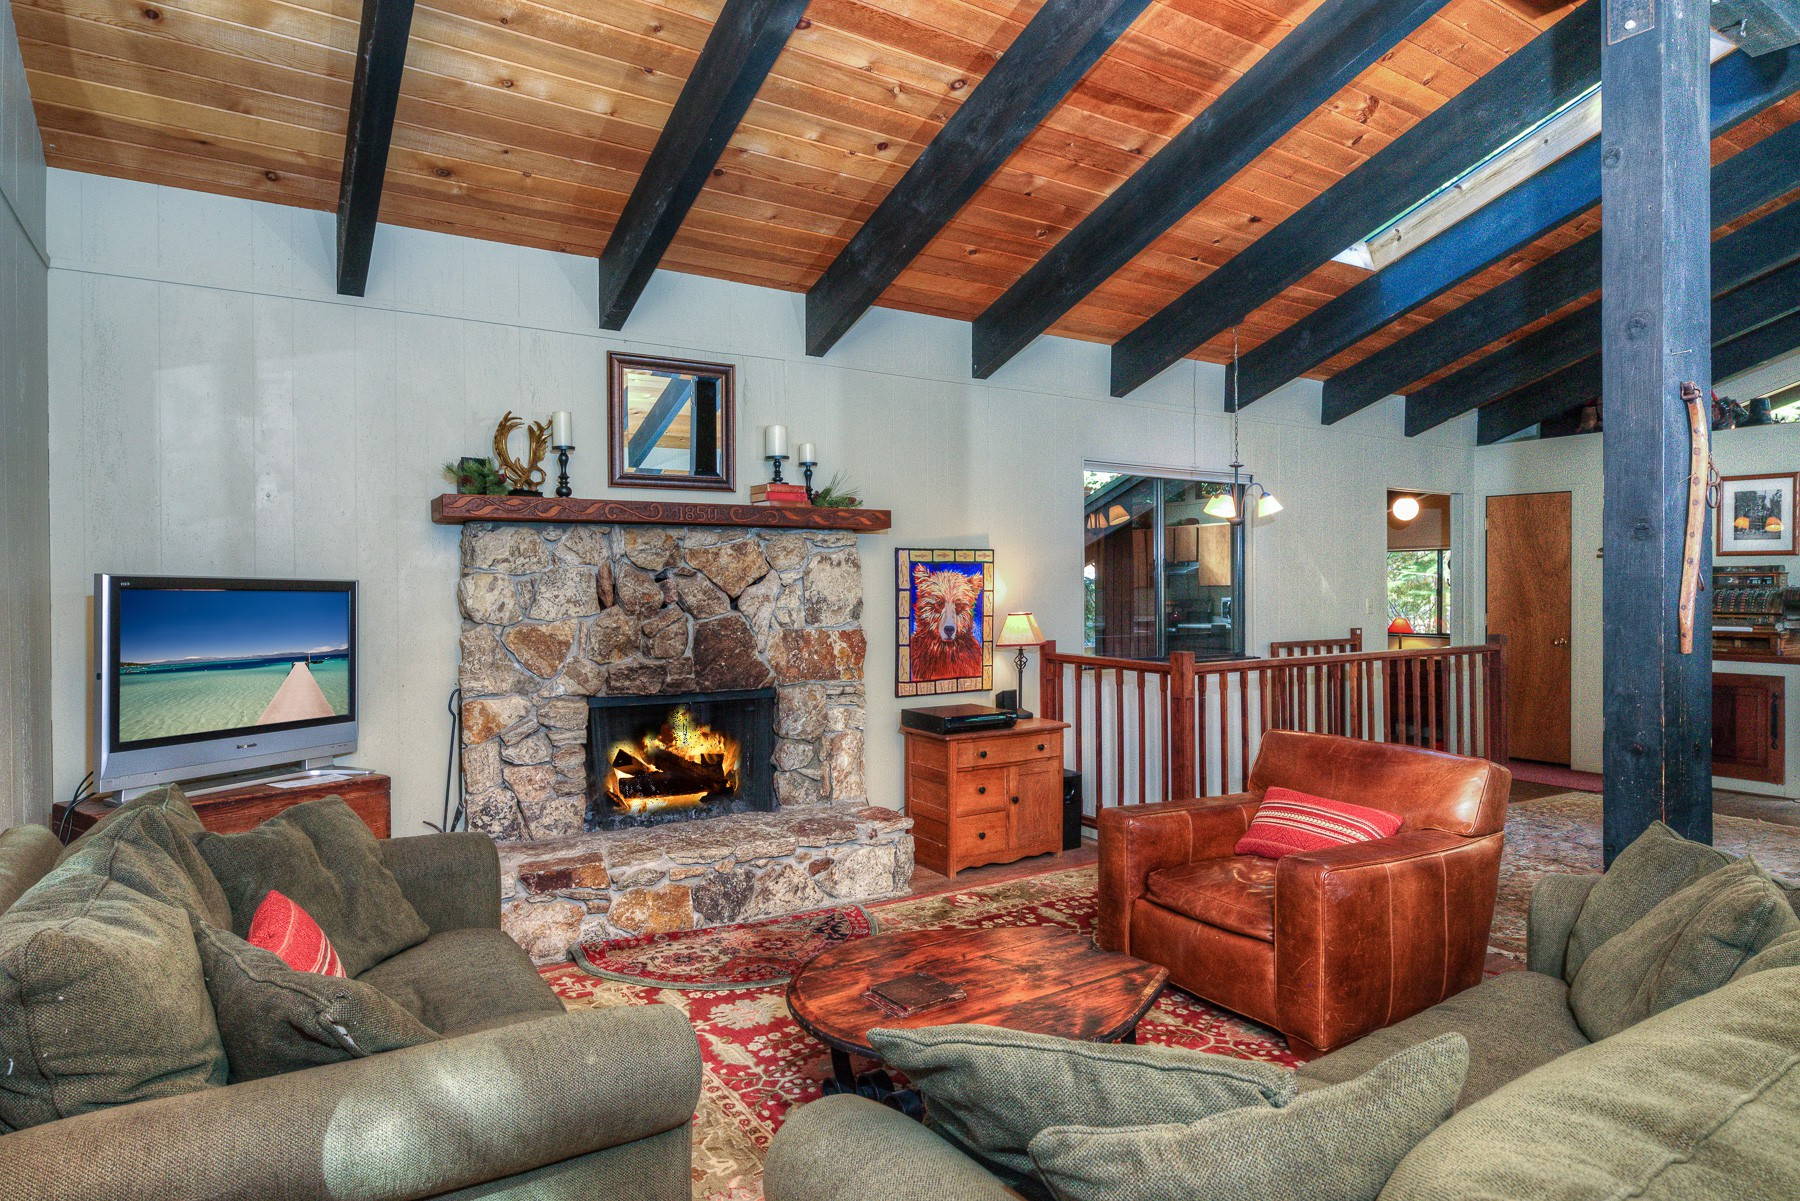 Homewood CA Vacation Rental Welcome to Homewood!